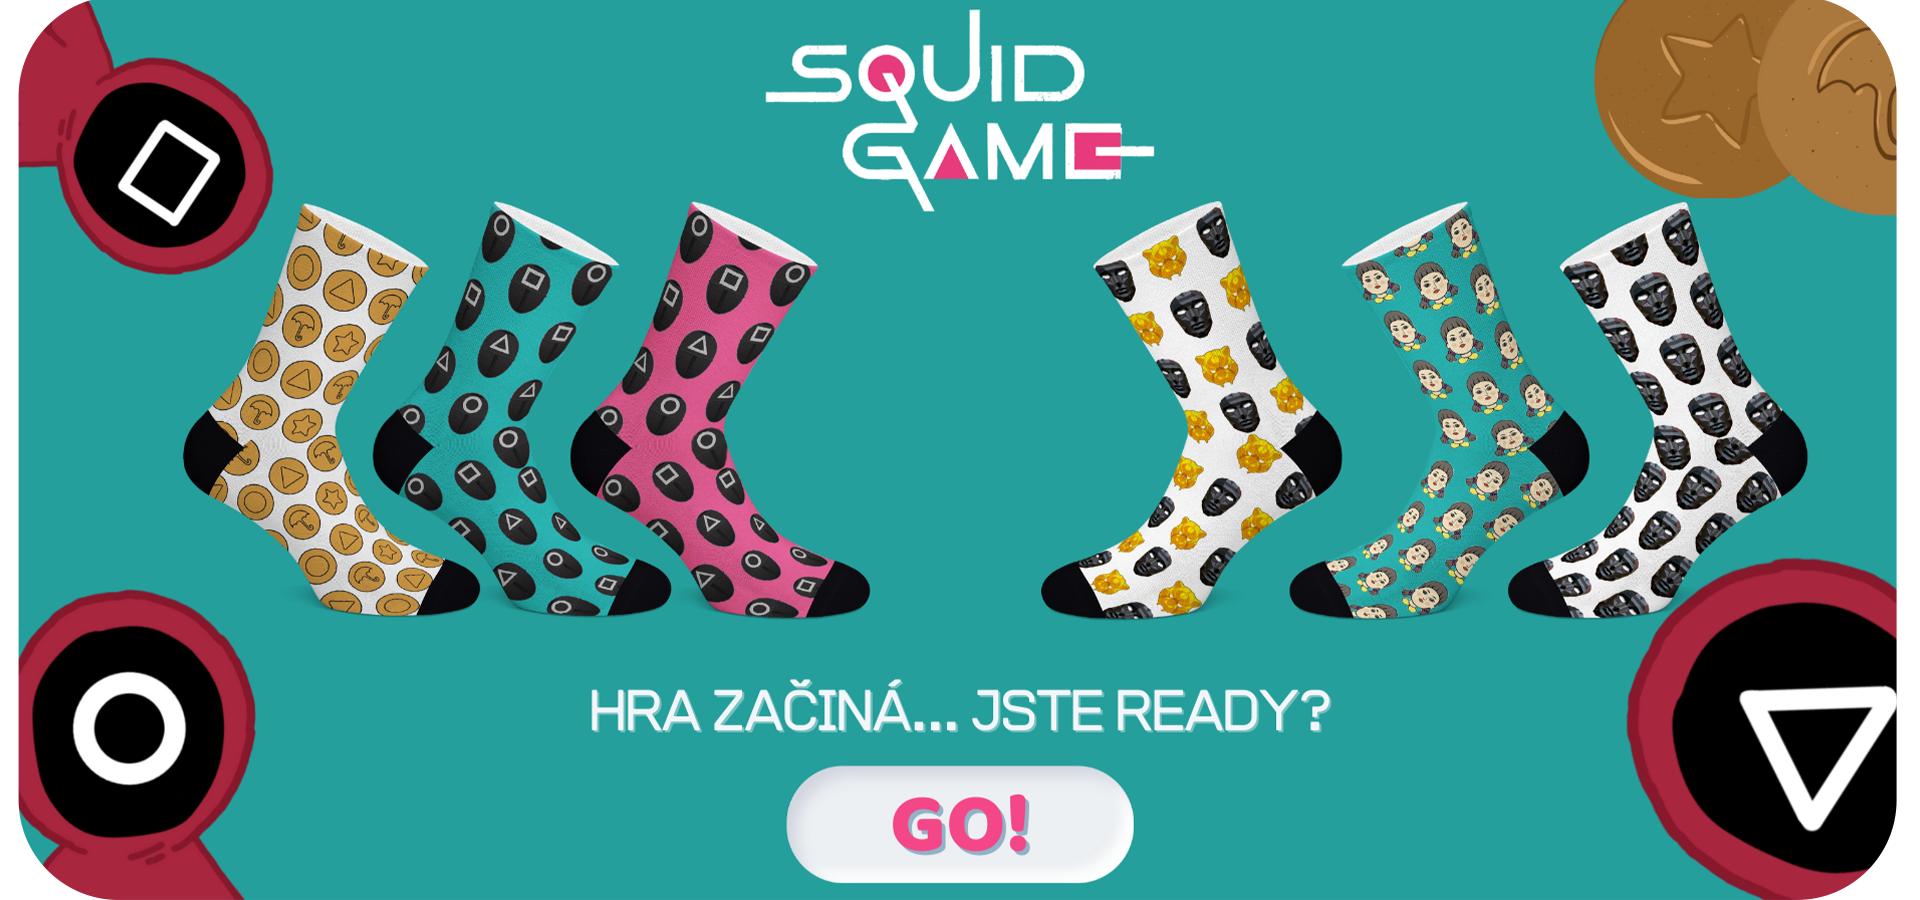 PC squid game ponožky 2021